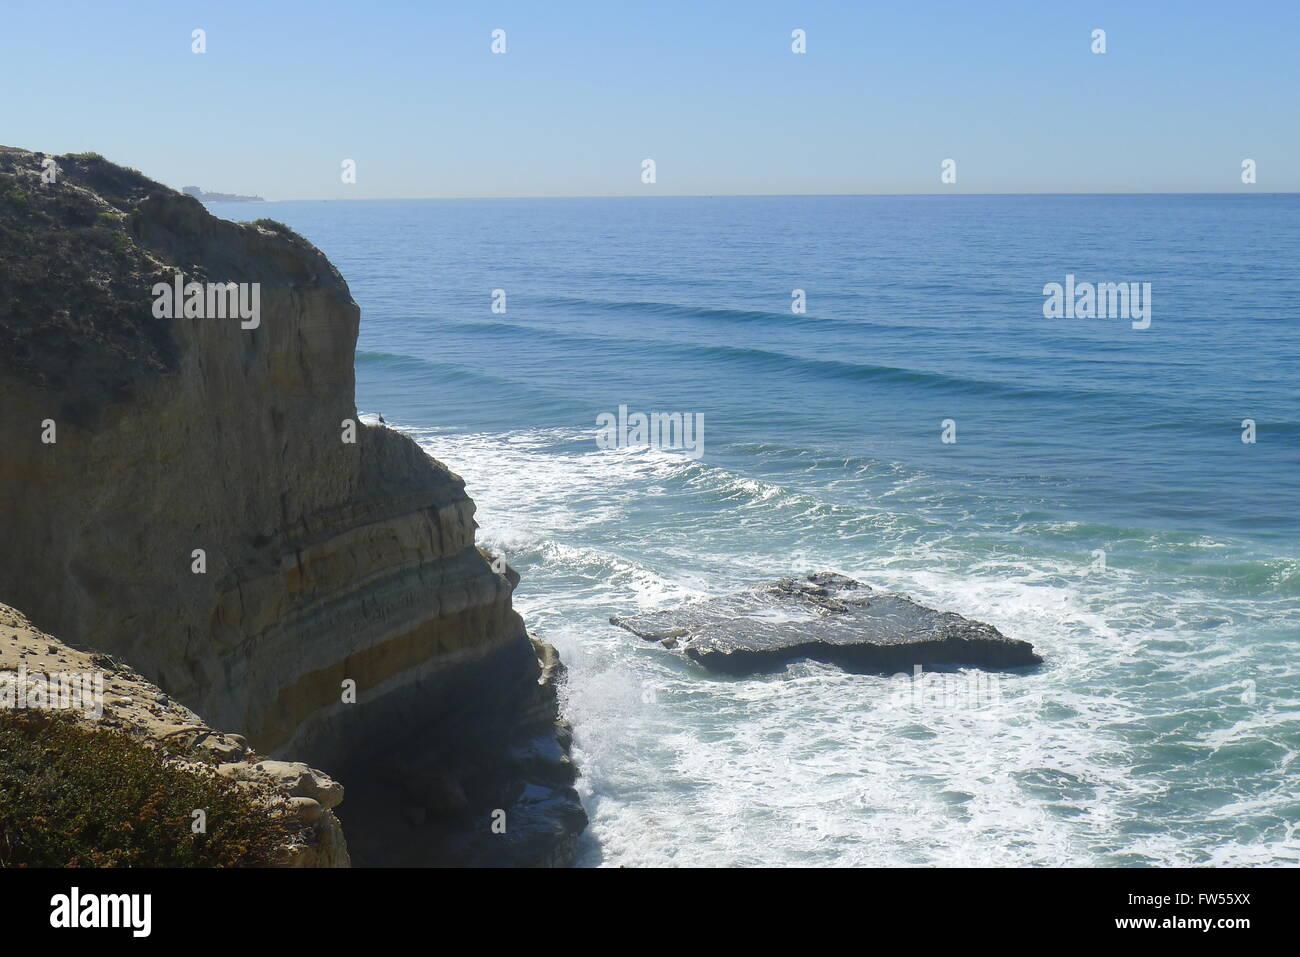 Flat Rock on Pacific Ocean San Diego - Stock Image